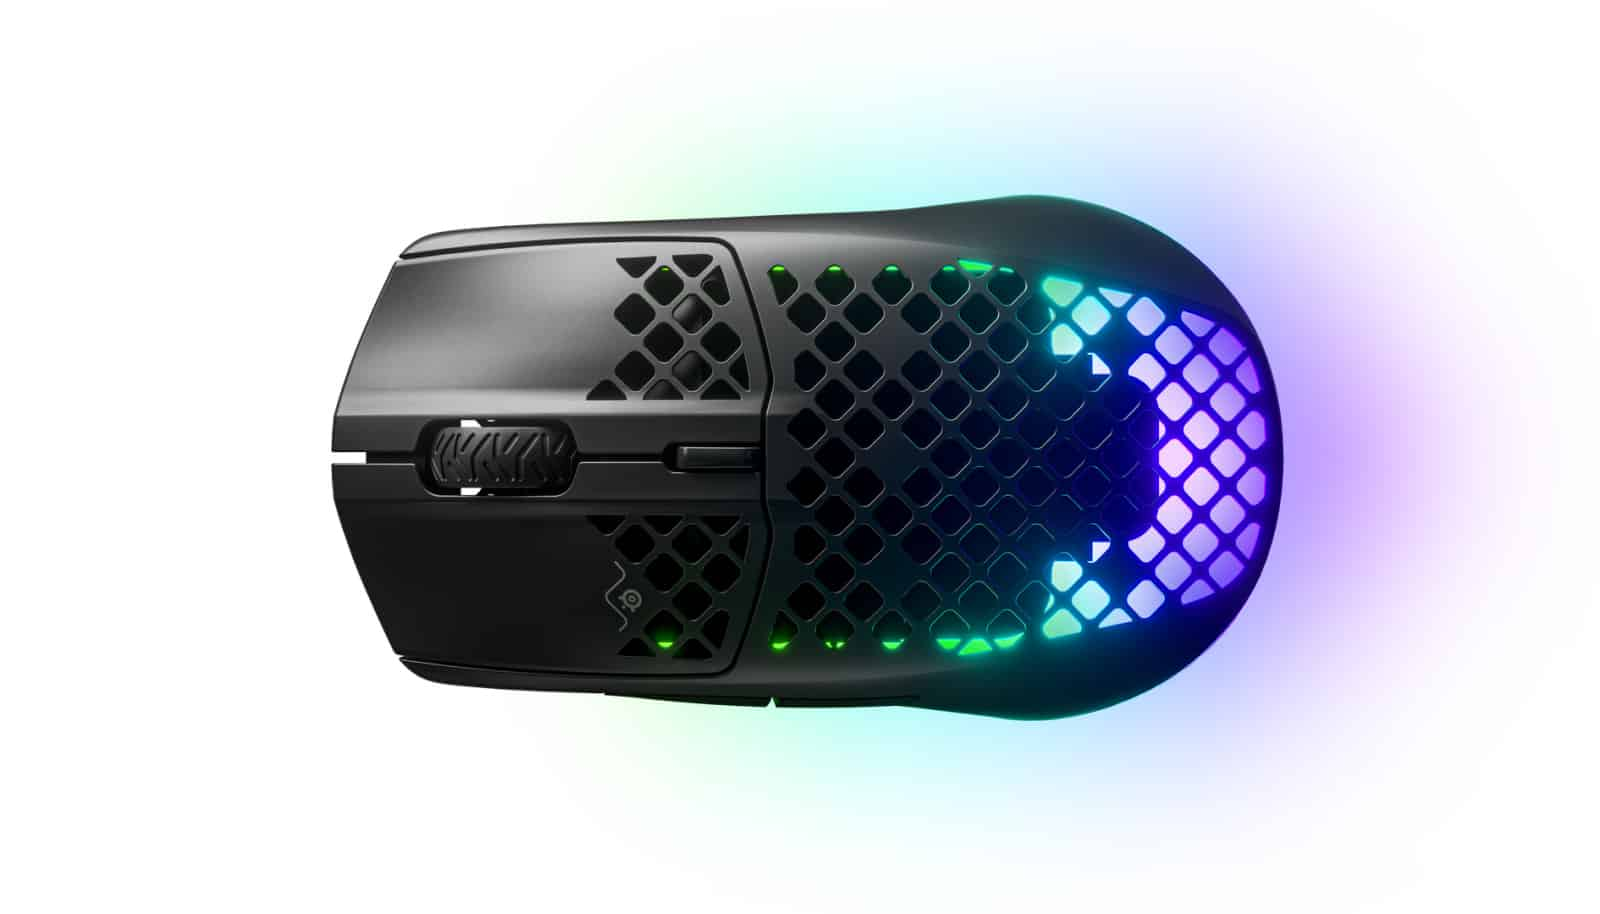 SteelSeries Aerox 3 Wireless 5